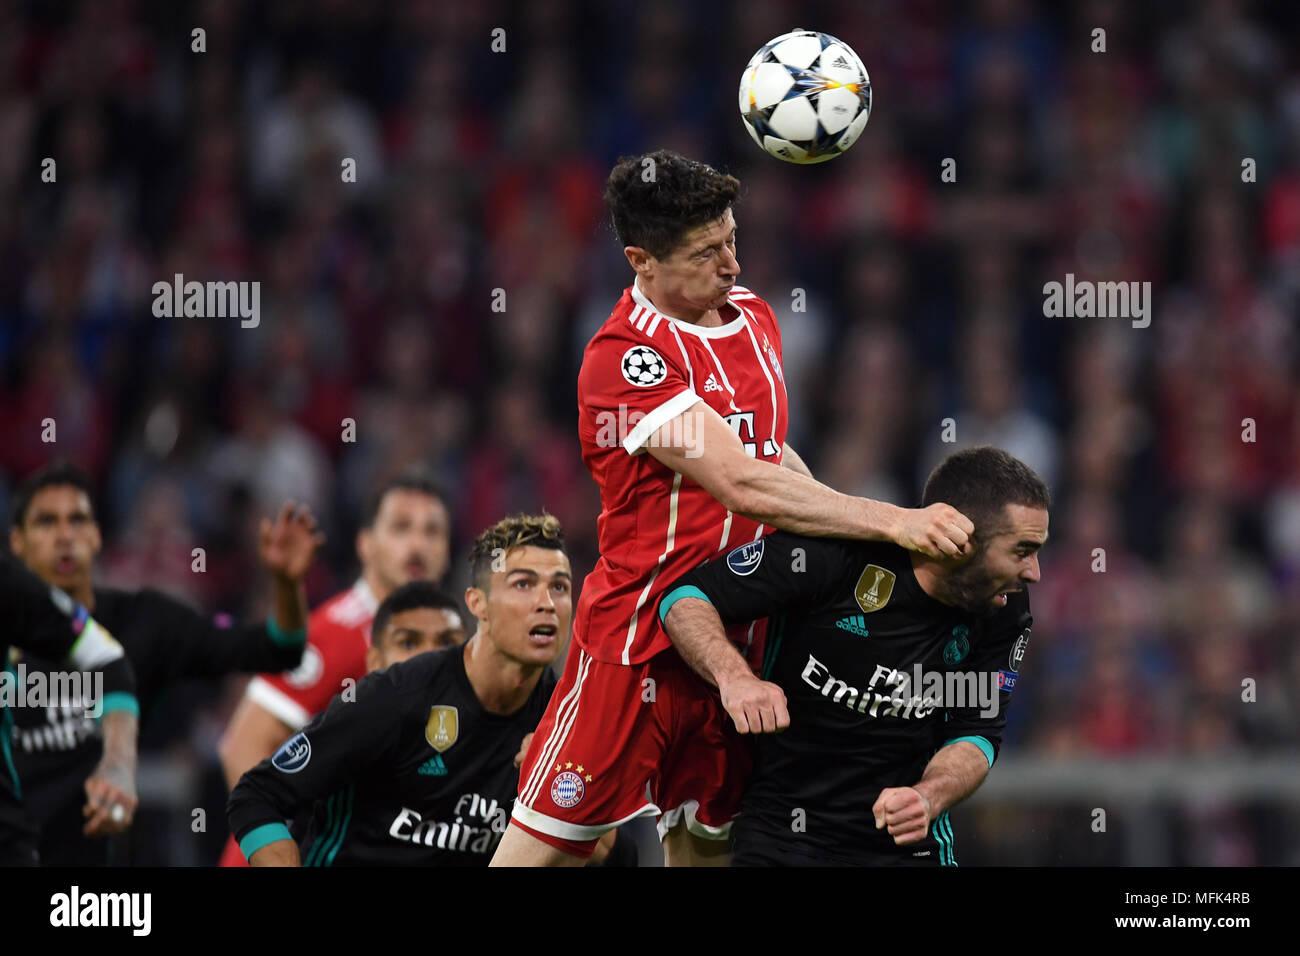 9fa245c82 25 april 2018, germany, munich: soccer, champions league, knockout